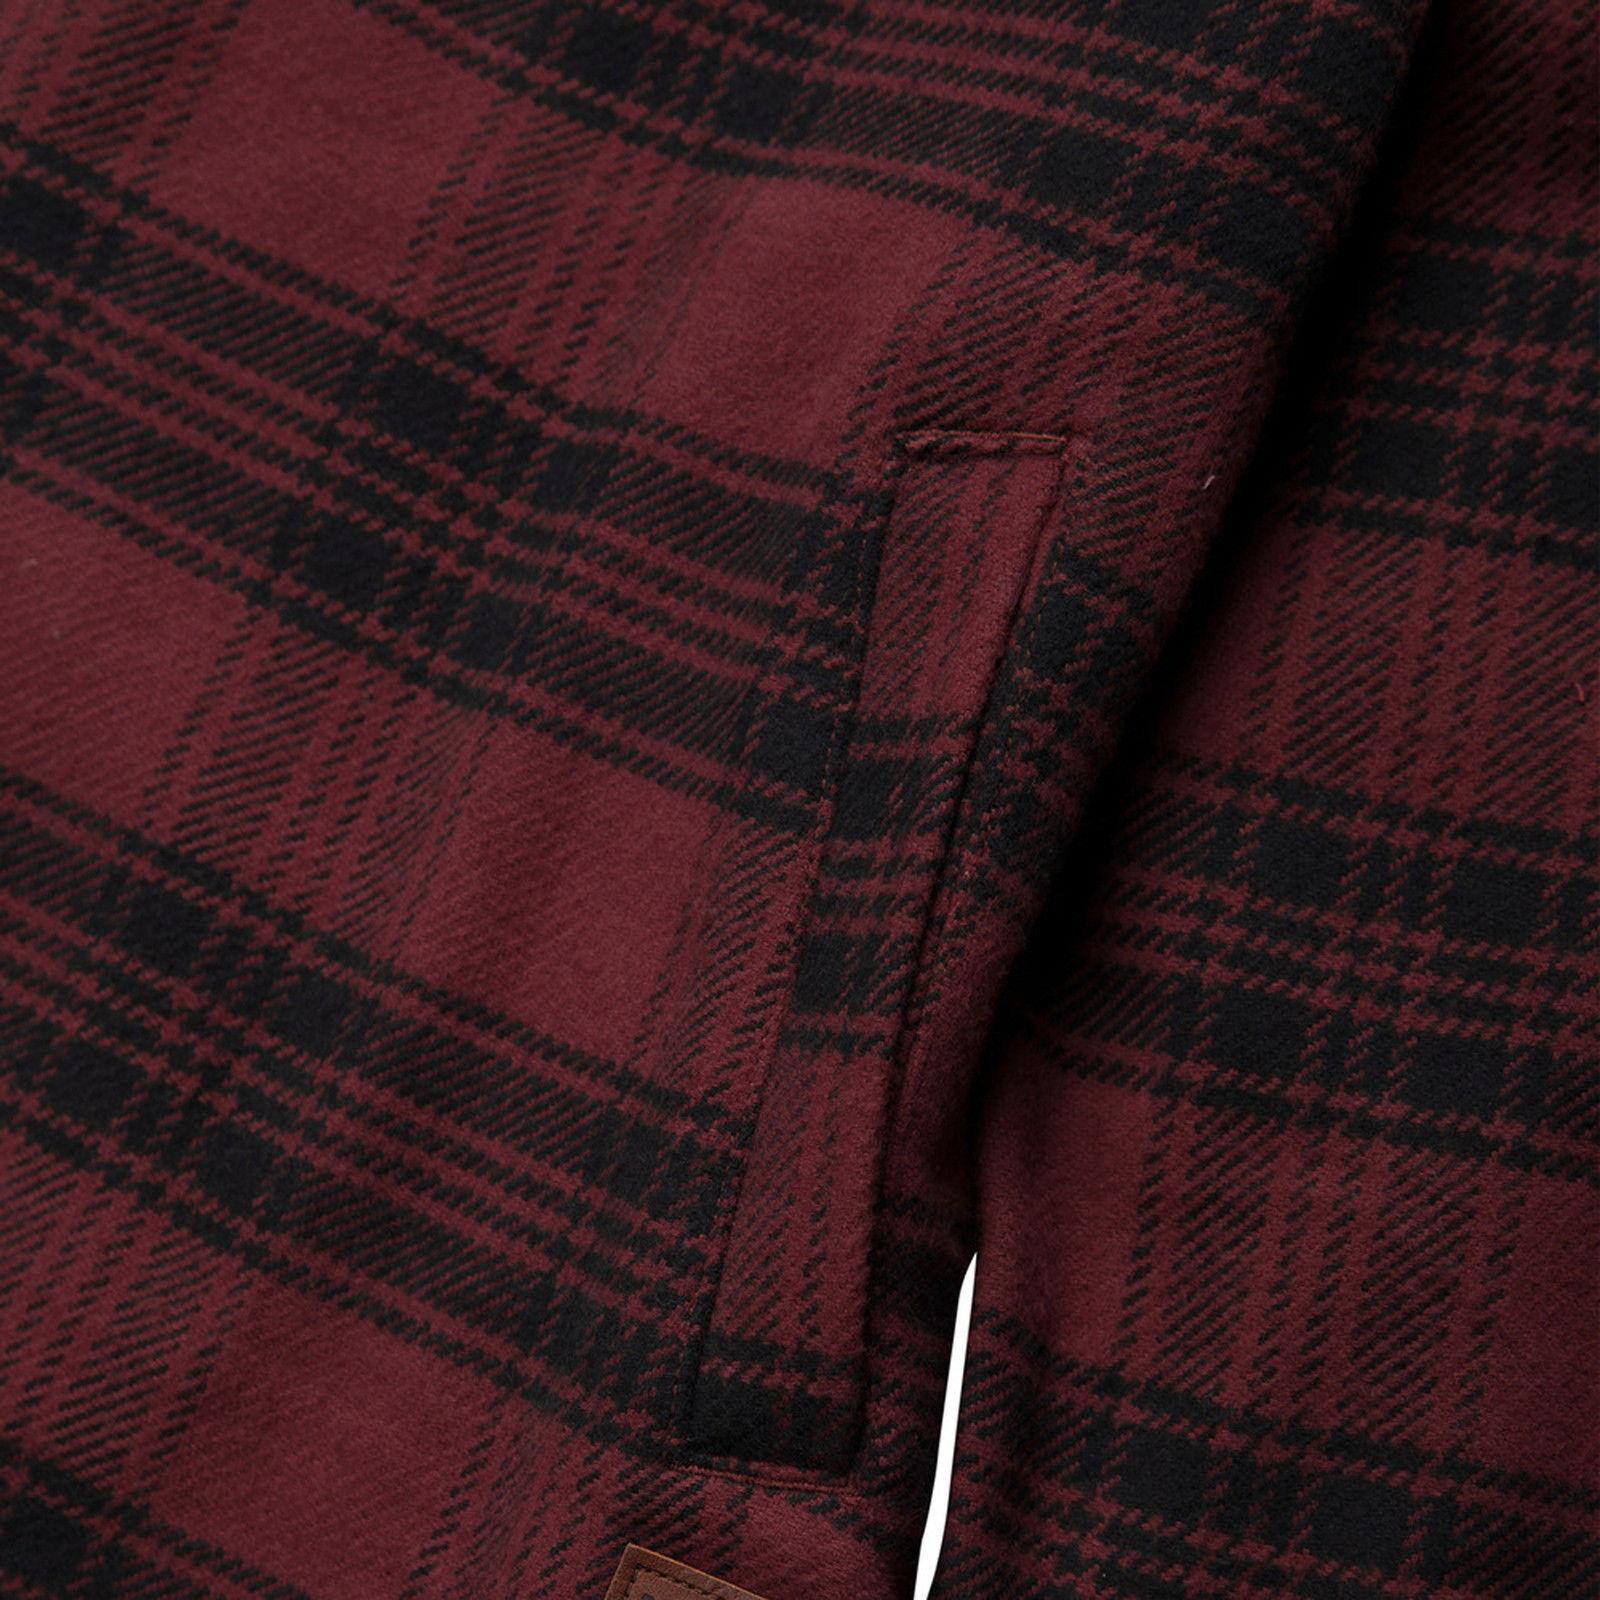 Camicia flanella uomo manica lunga lunga lunga a quadri Billabong calda con tasche da skate 2eaf86